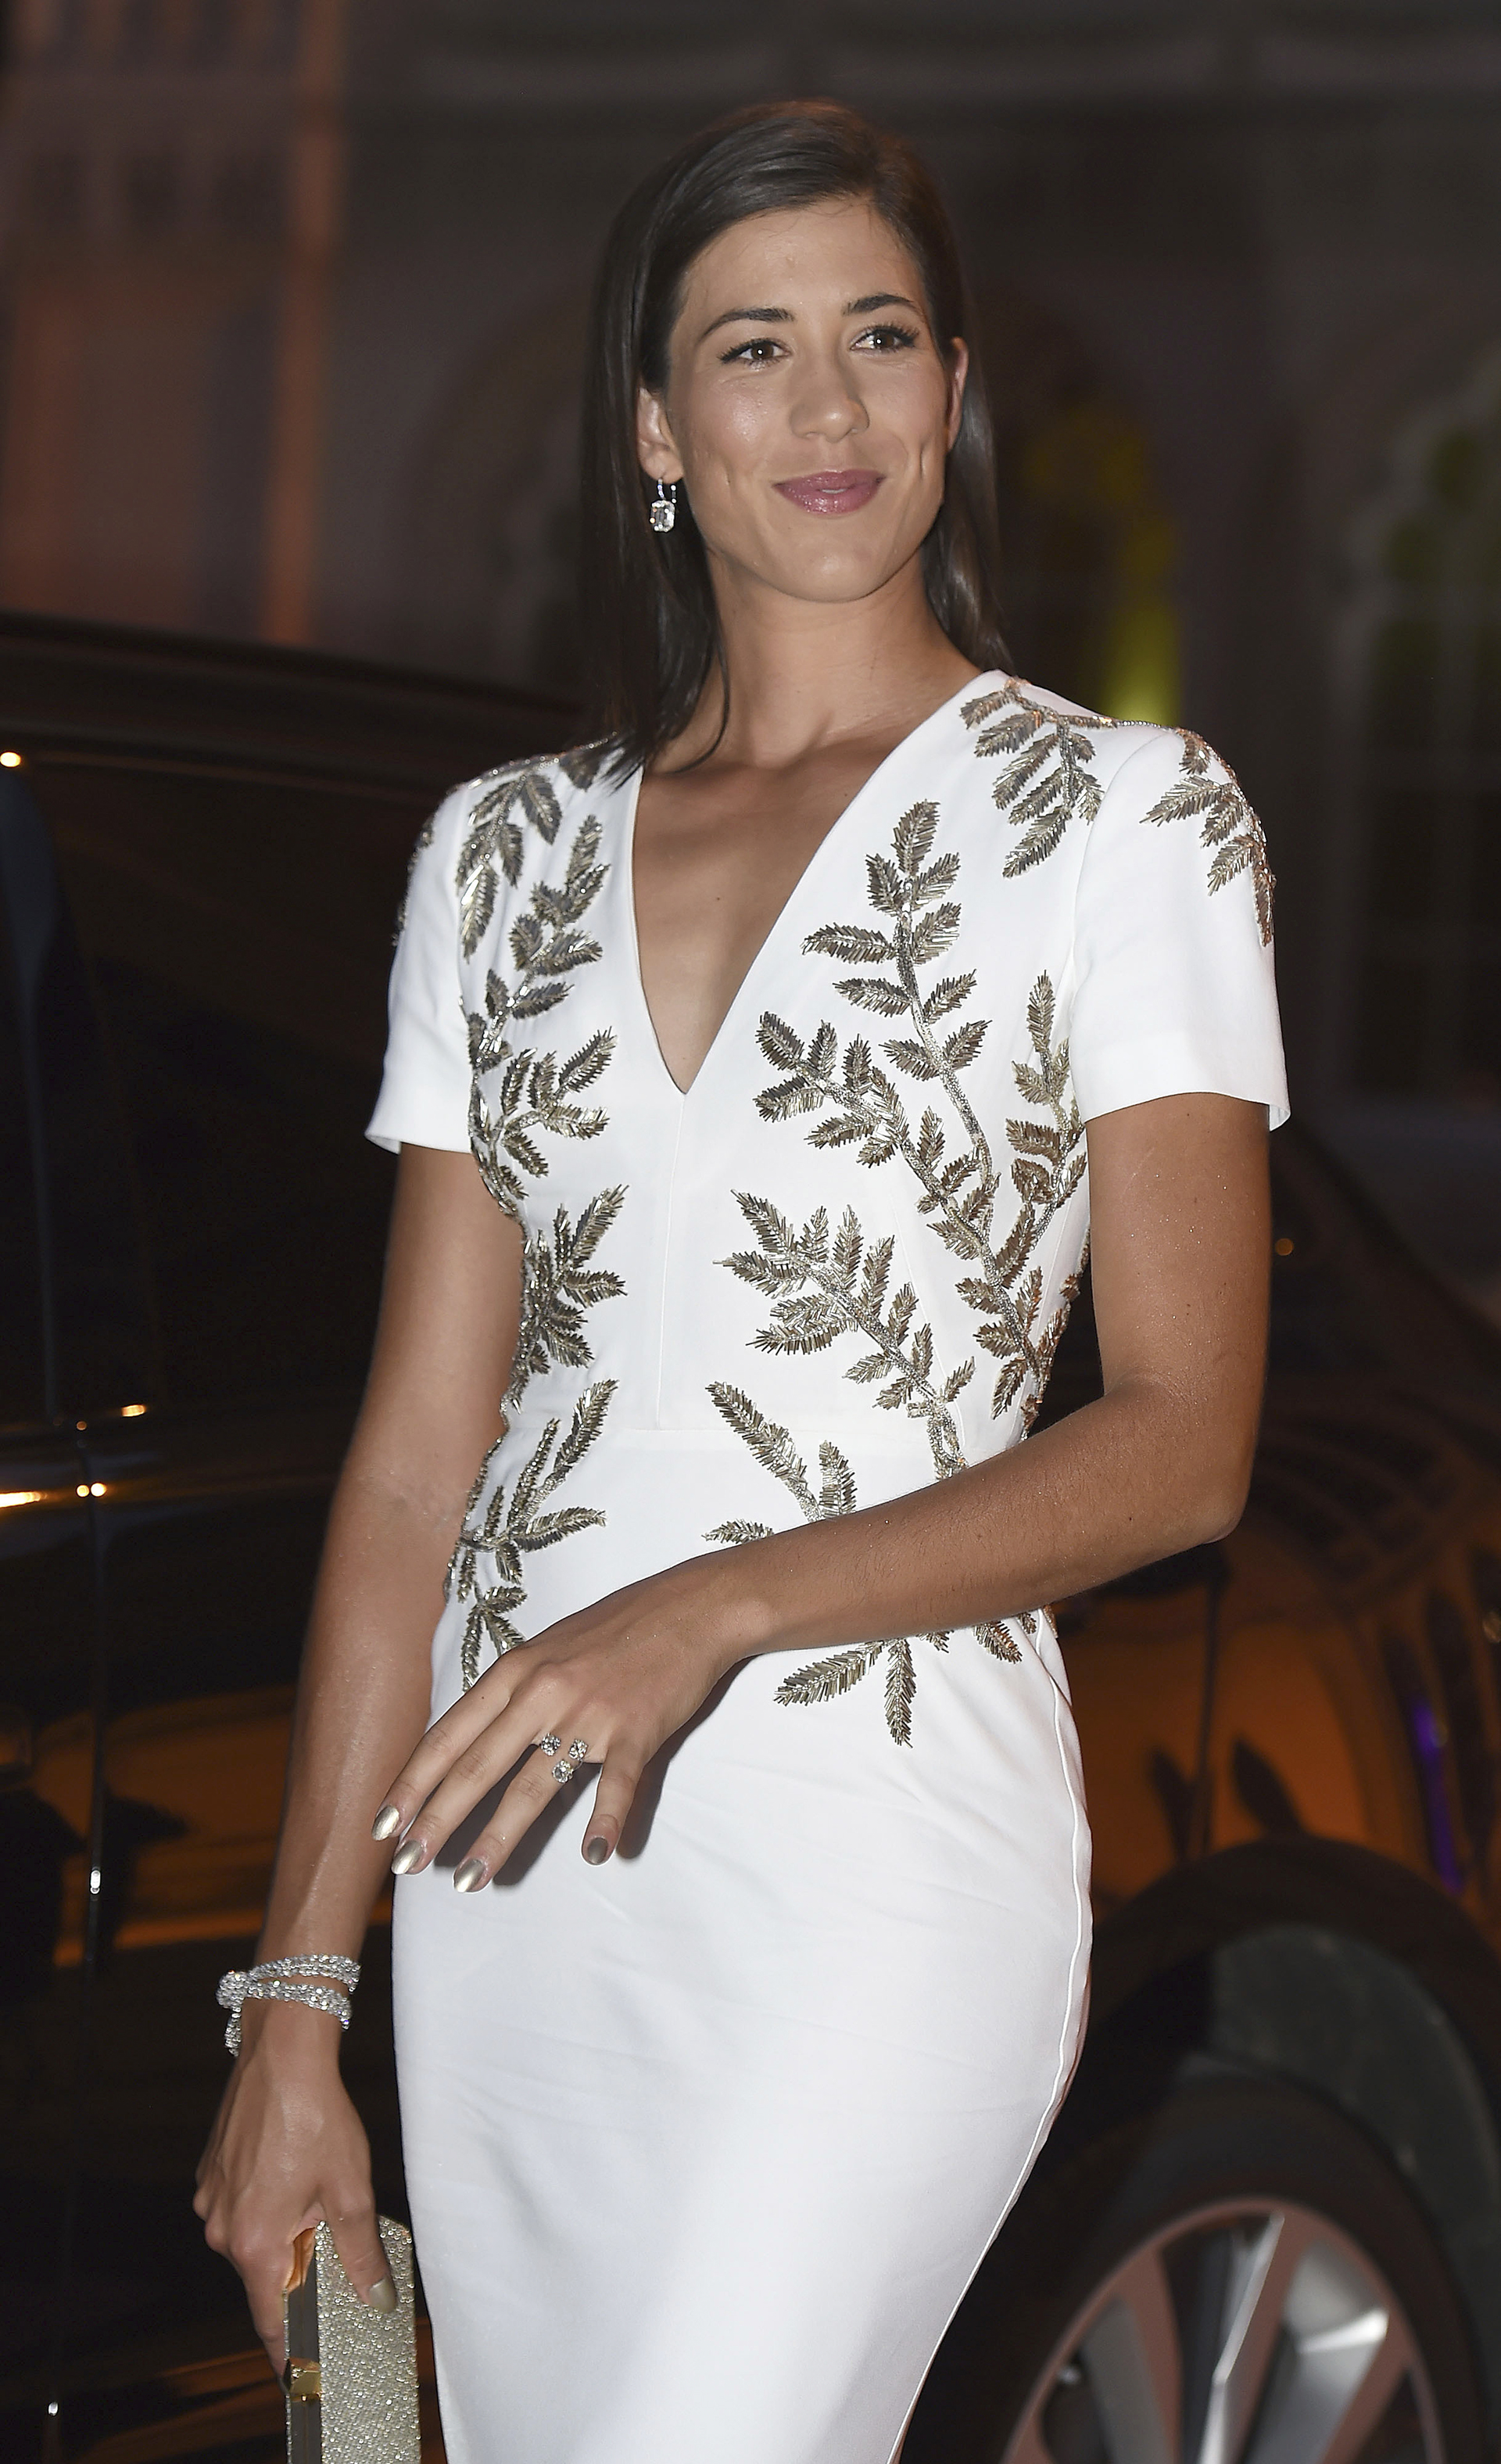 La hispano-venezolana Garbiñe Muguruza se coronó por primera vez en Wimbledon (Lauren Hurley/PA via AP)